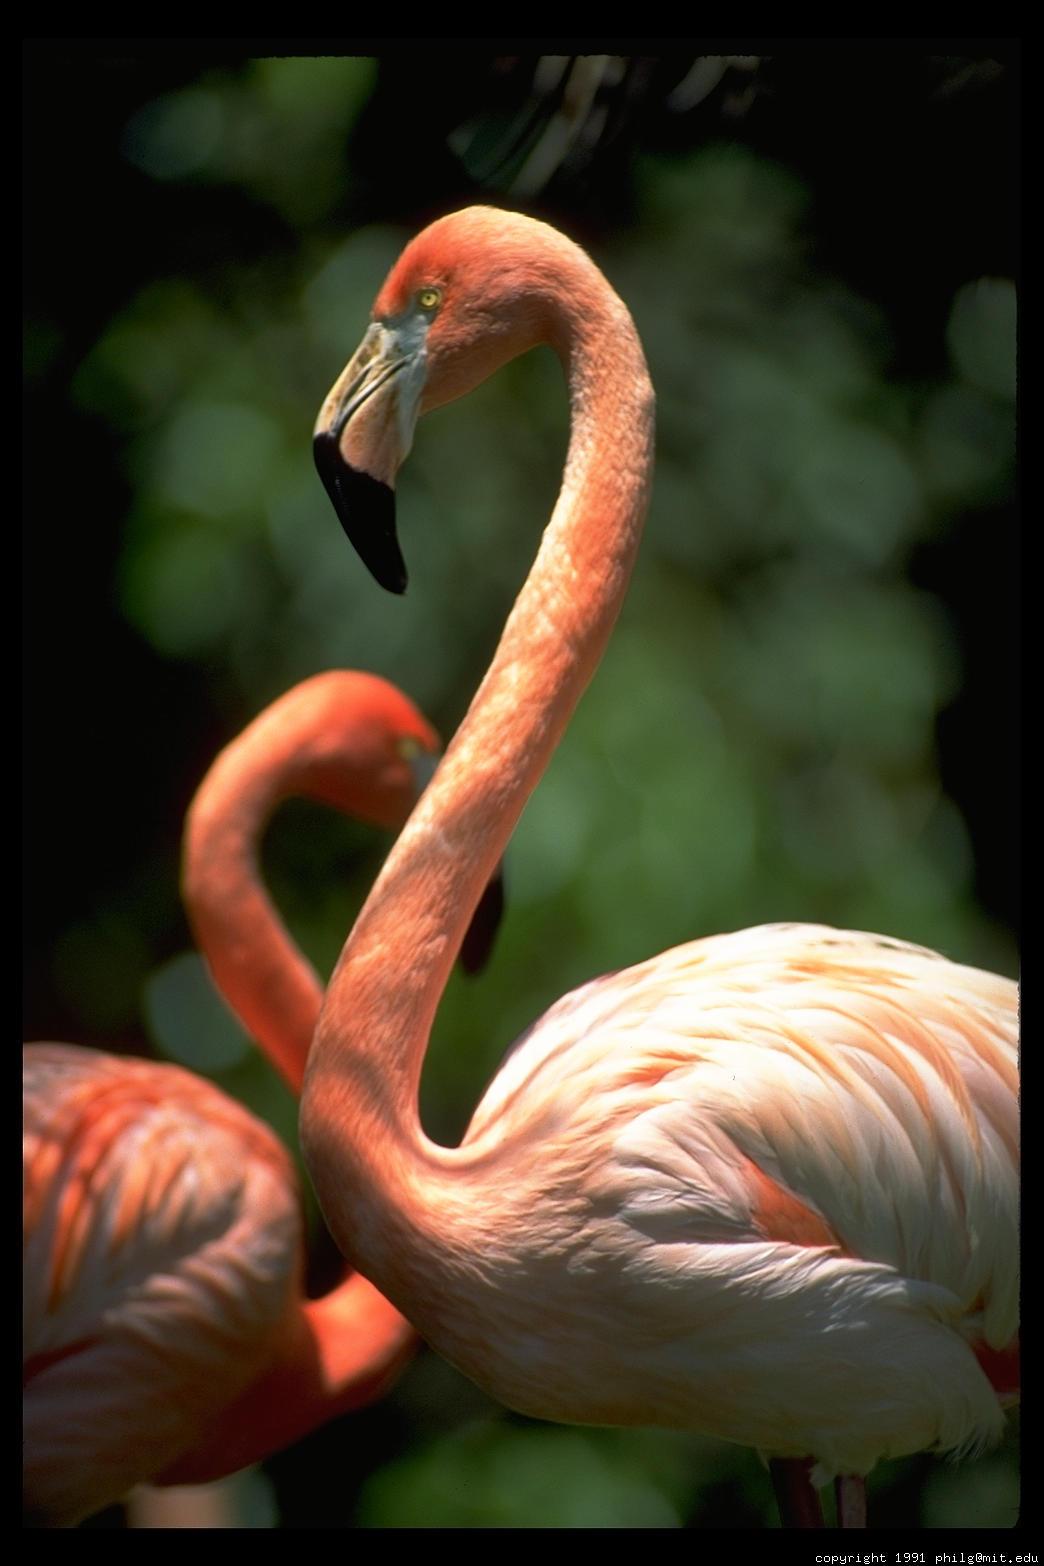 http://philip.greenspun.com/images/pcd1647/flamingo-double-19.4.jpg